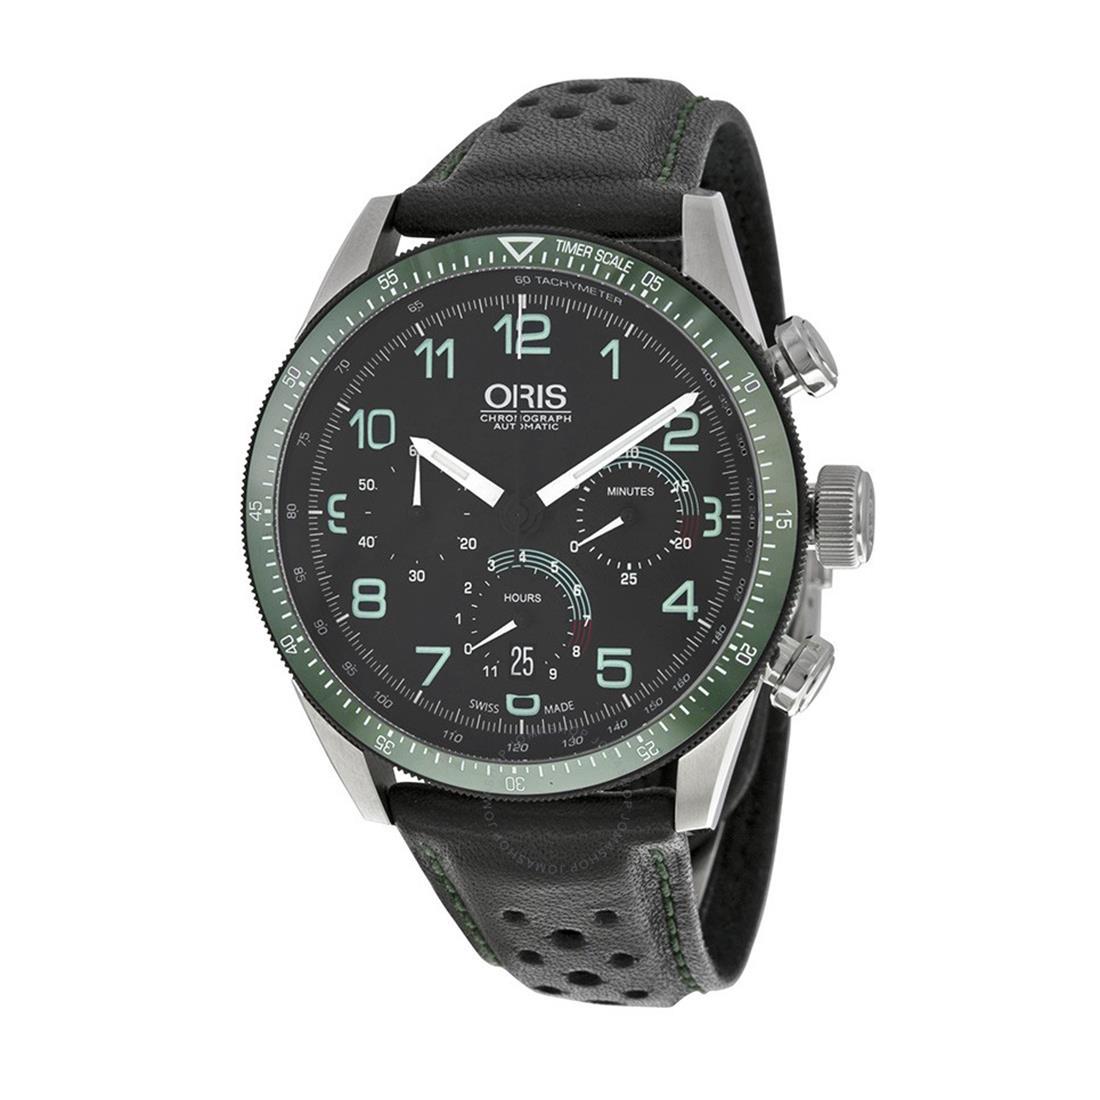 Orologio cronografo da uomo cassa 44mm  - ORIS